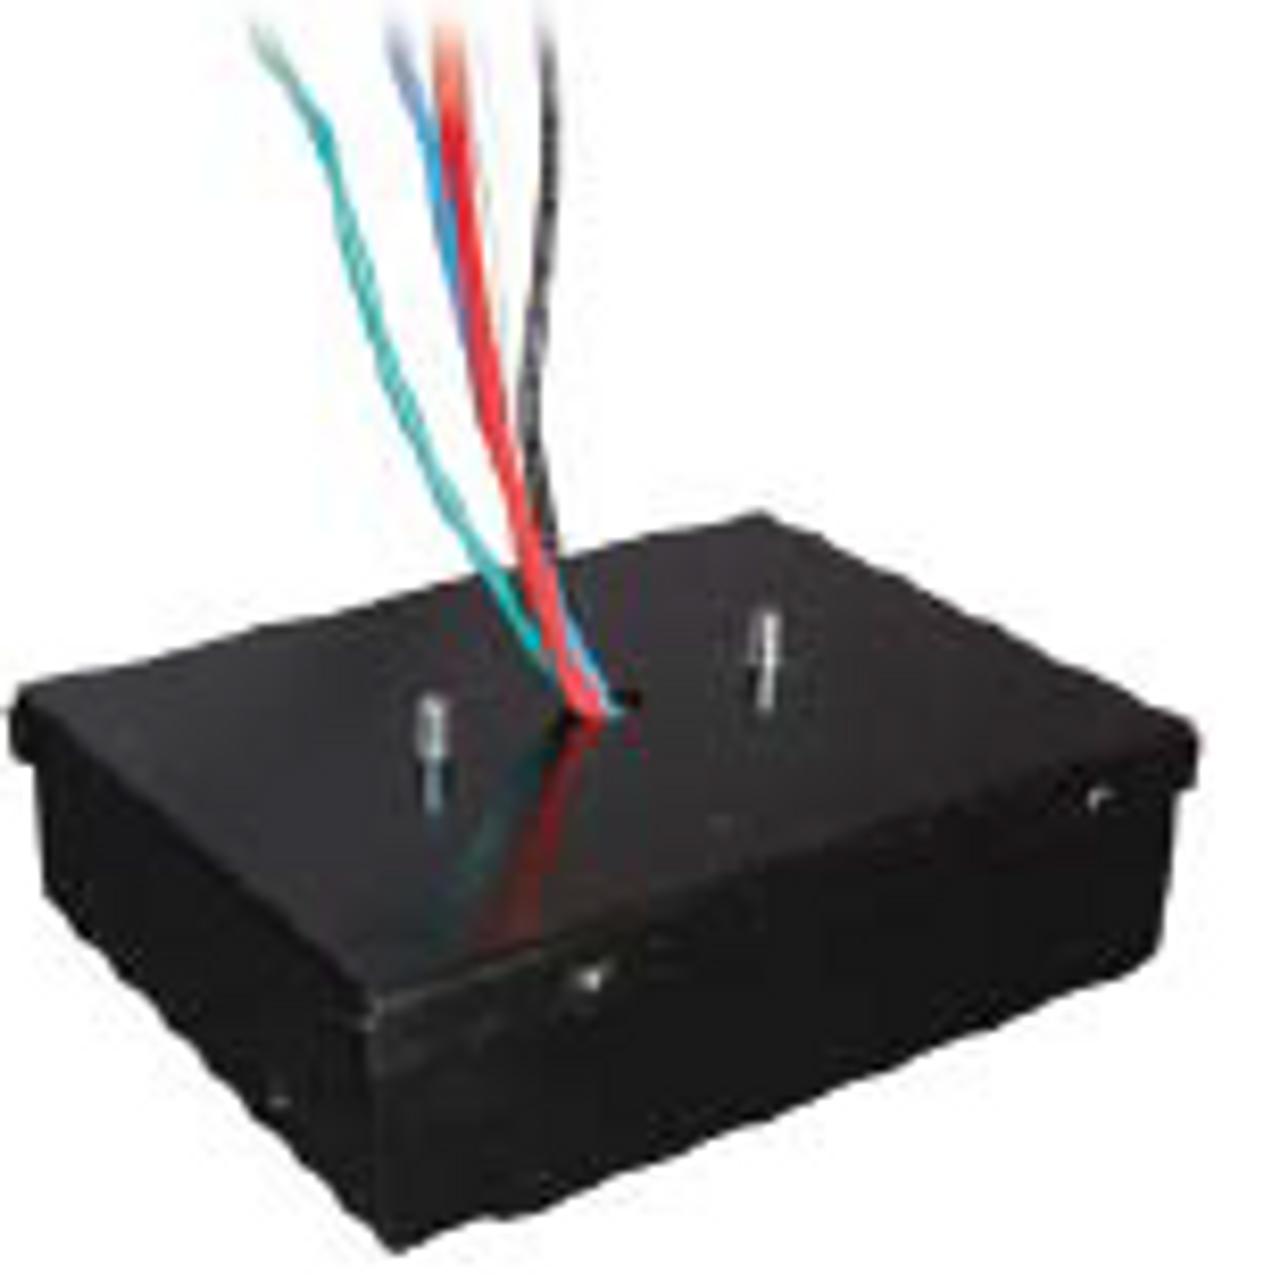 NIB Jefferson Electric 404-0150-04T Metal Halide Ballast Kit 150 Watt 120-277 V